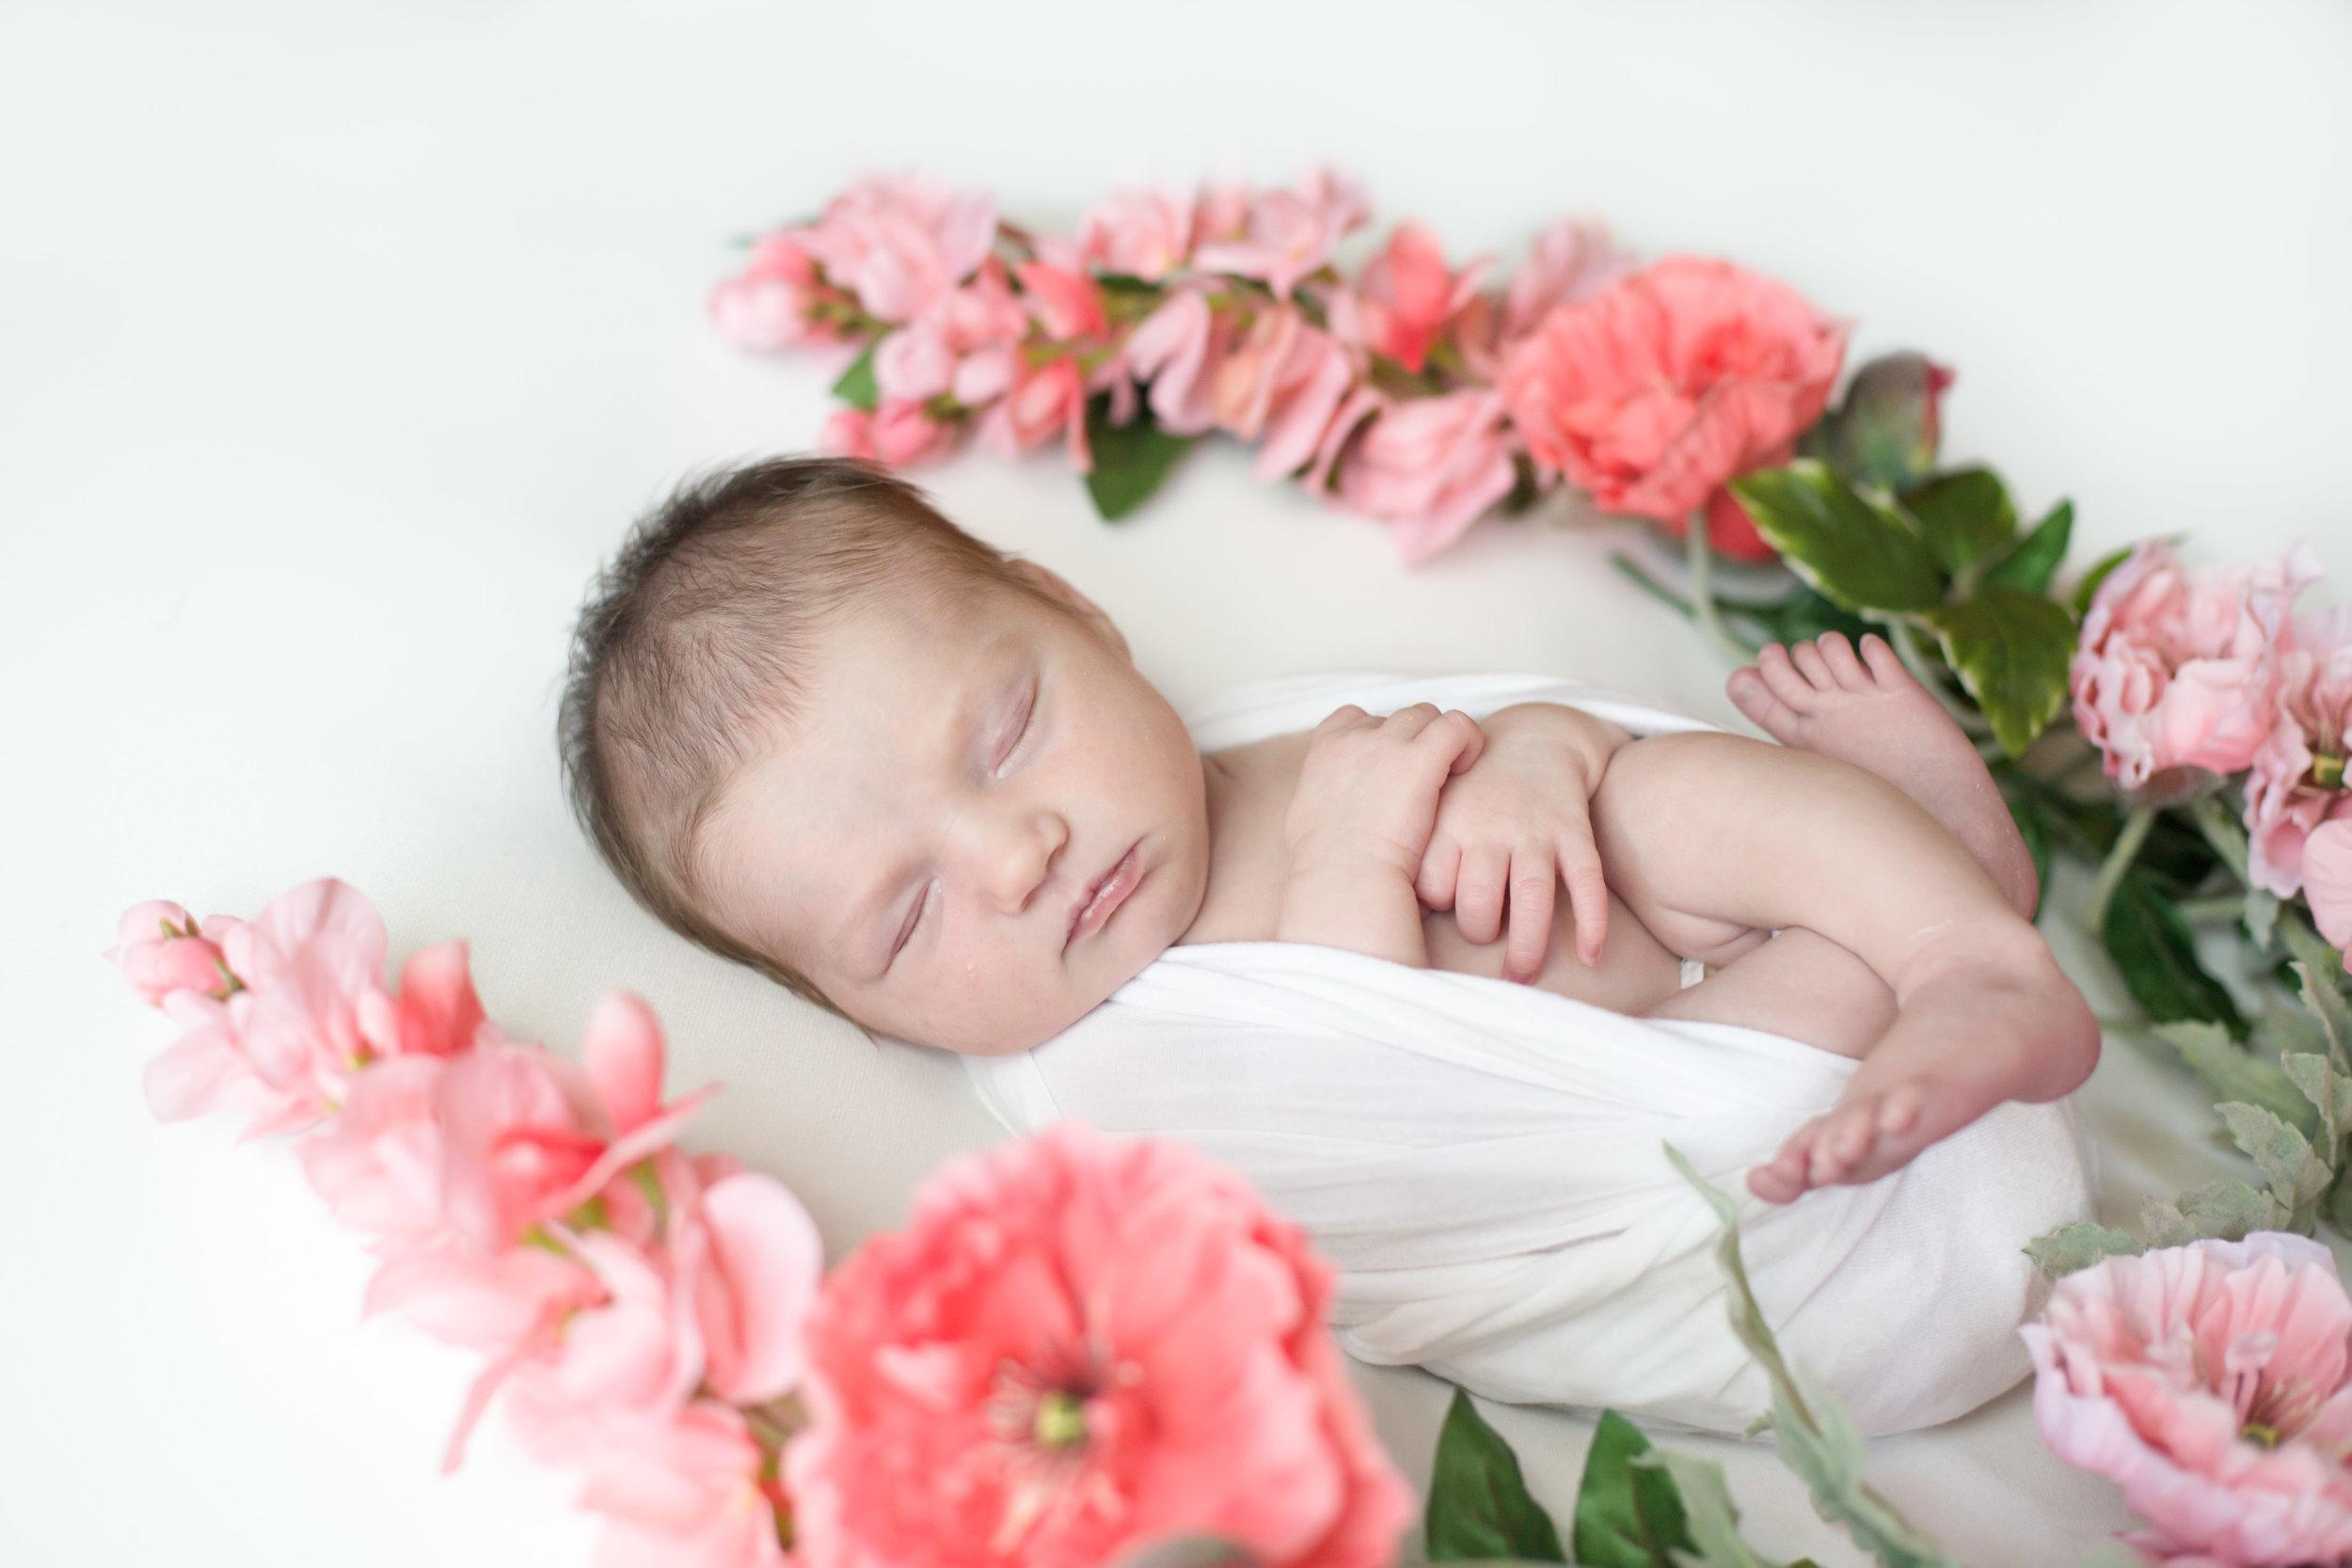 Floral Wreath Newborn Girl